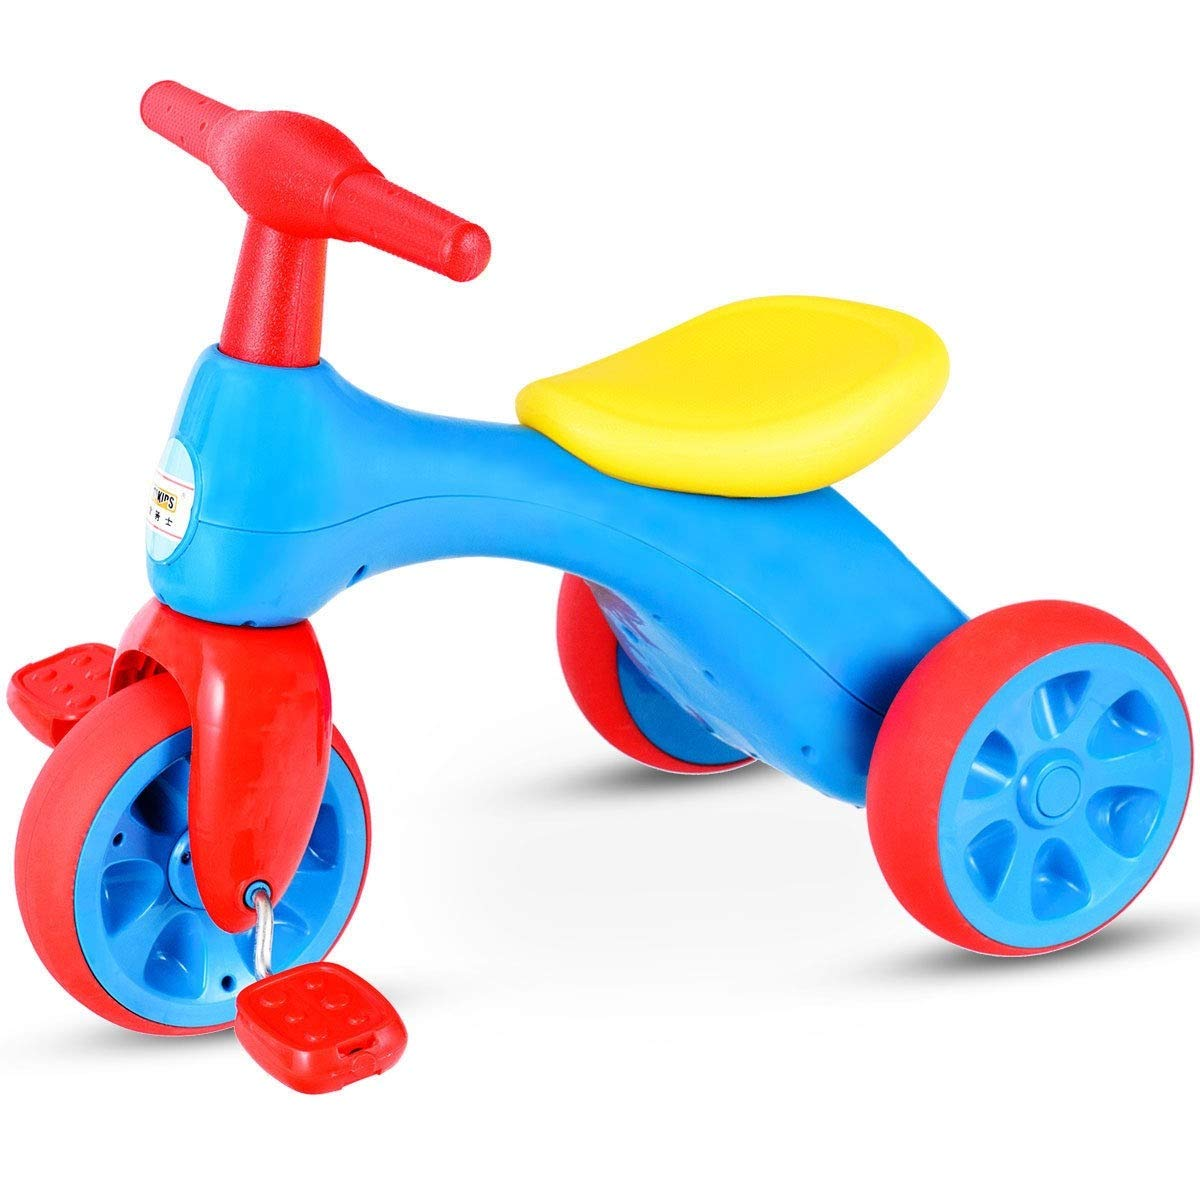 USA_BEST_SELLER Kids Riding Balance Bike with Sound and Storage Box Baby Trike